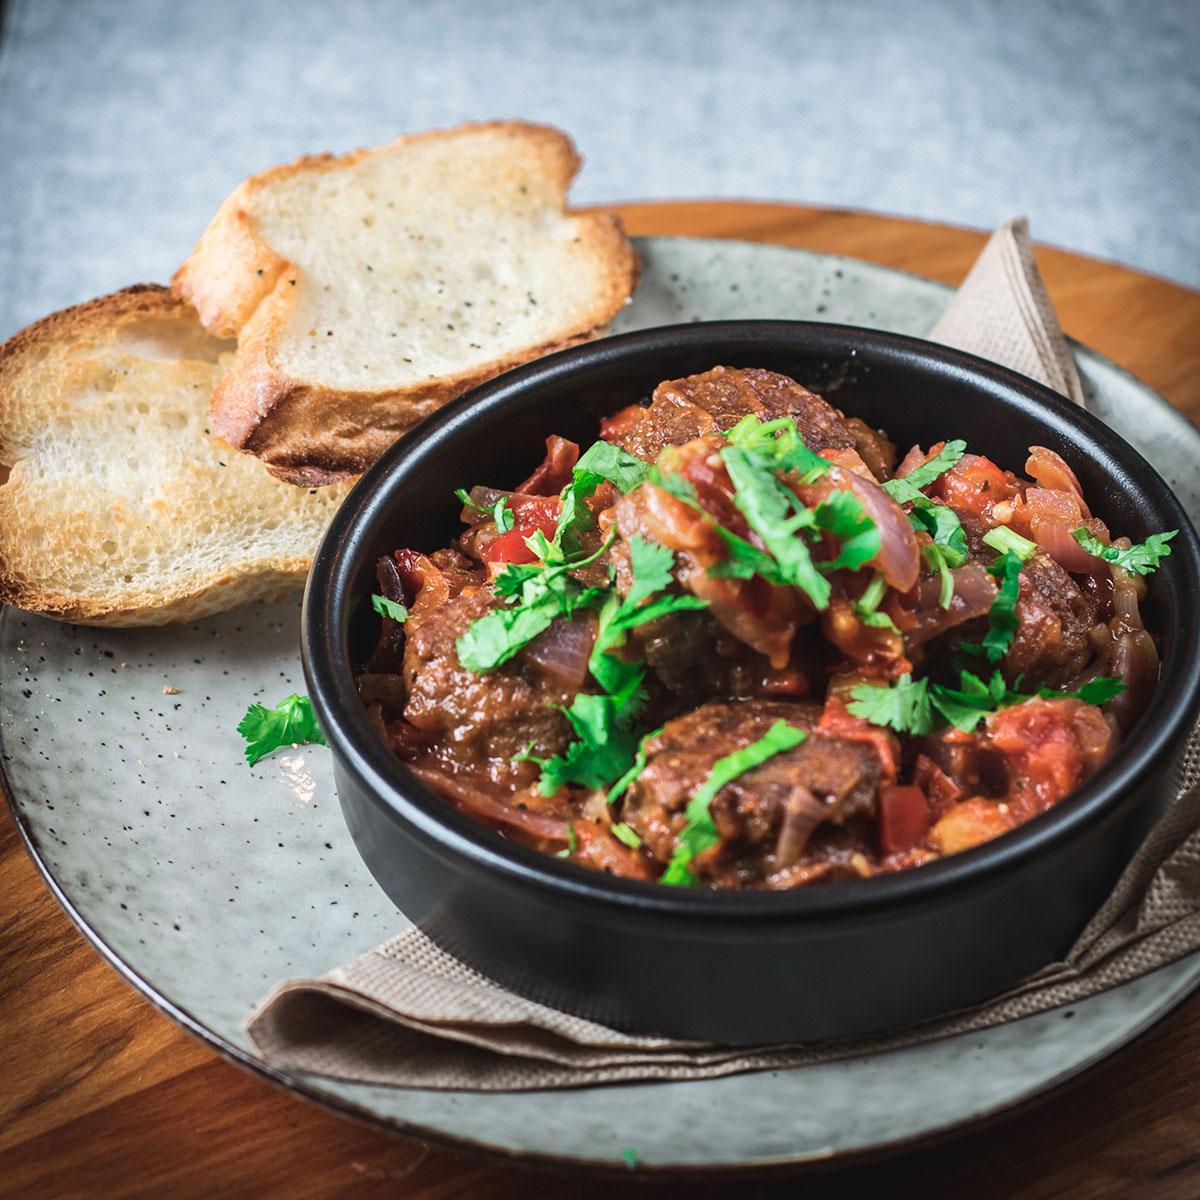 joes-eatery-food-sharing-plates-meatballs